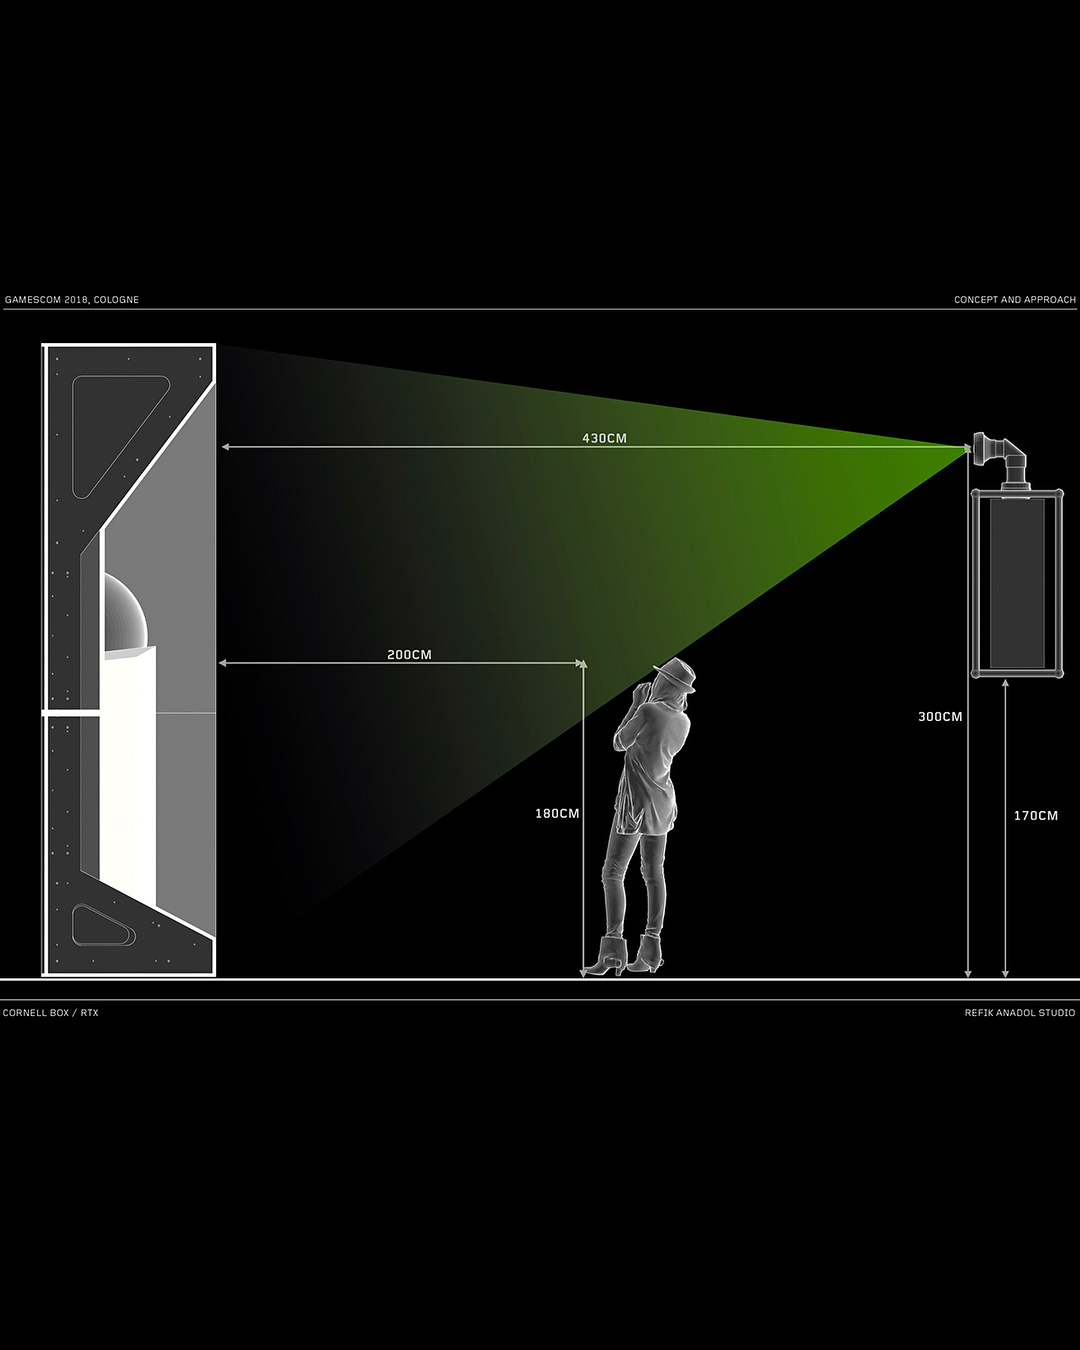 refik-anadol-nvidia1.jpg